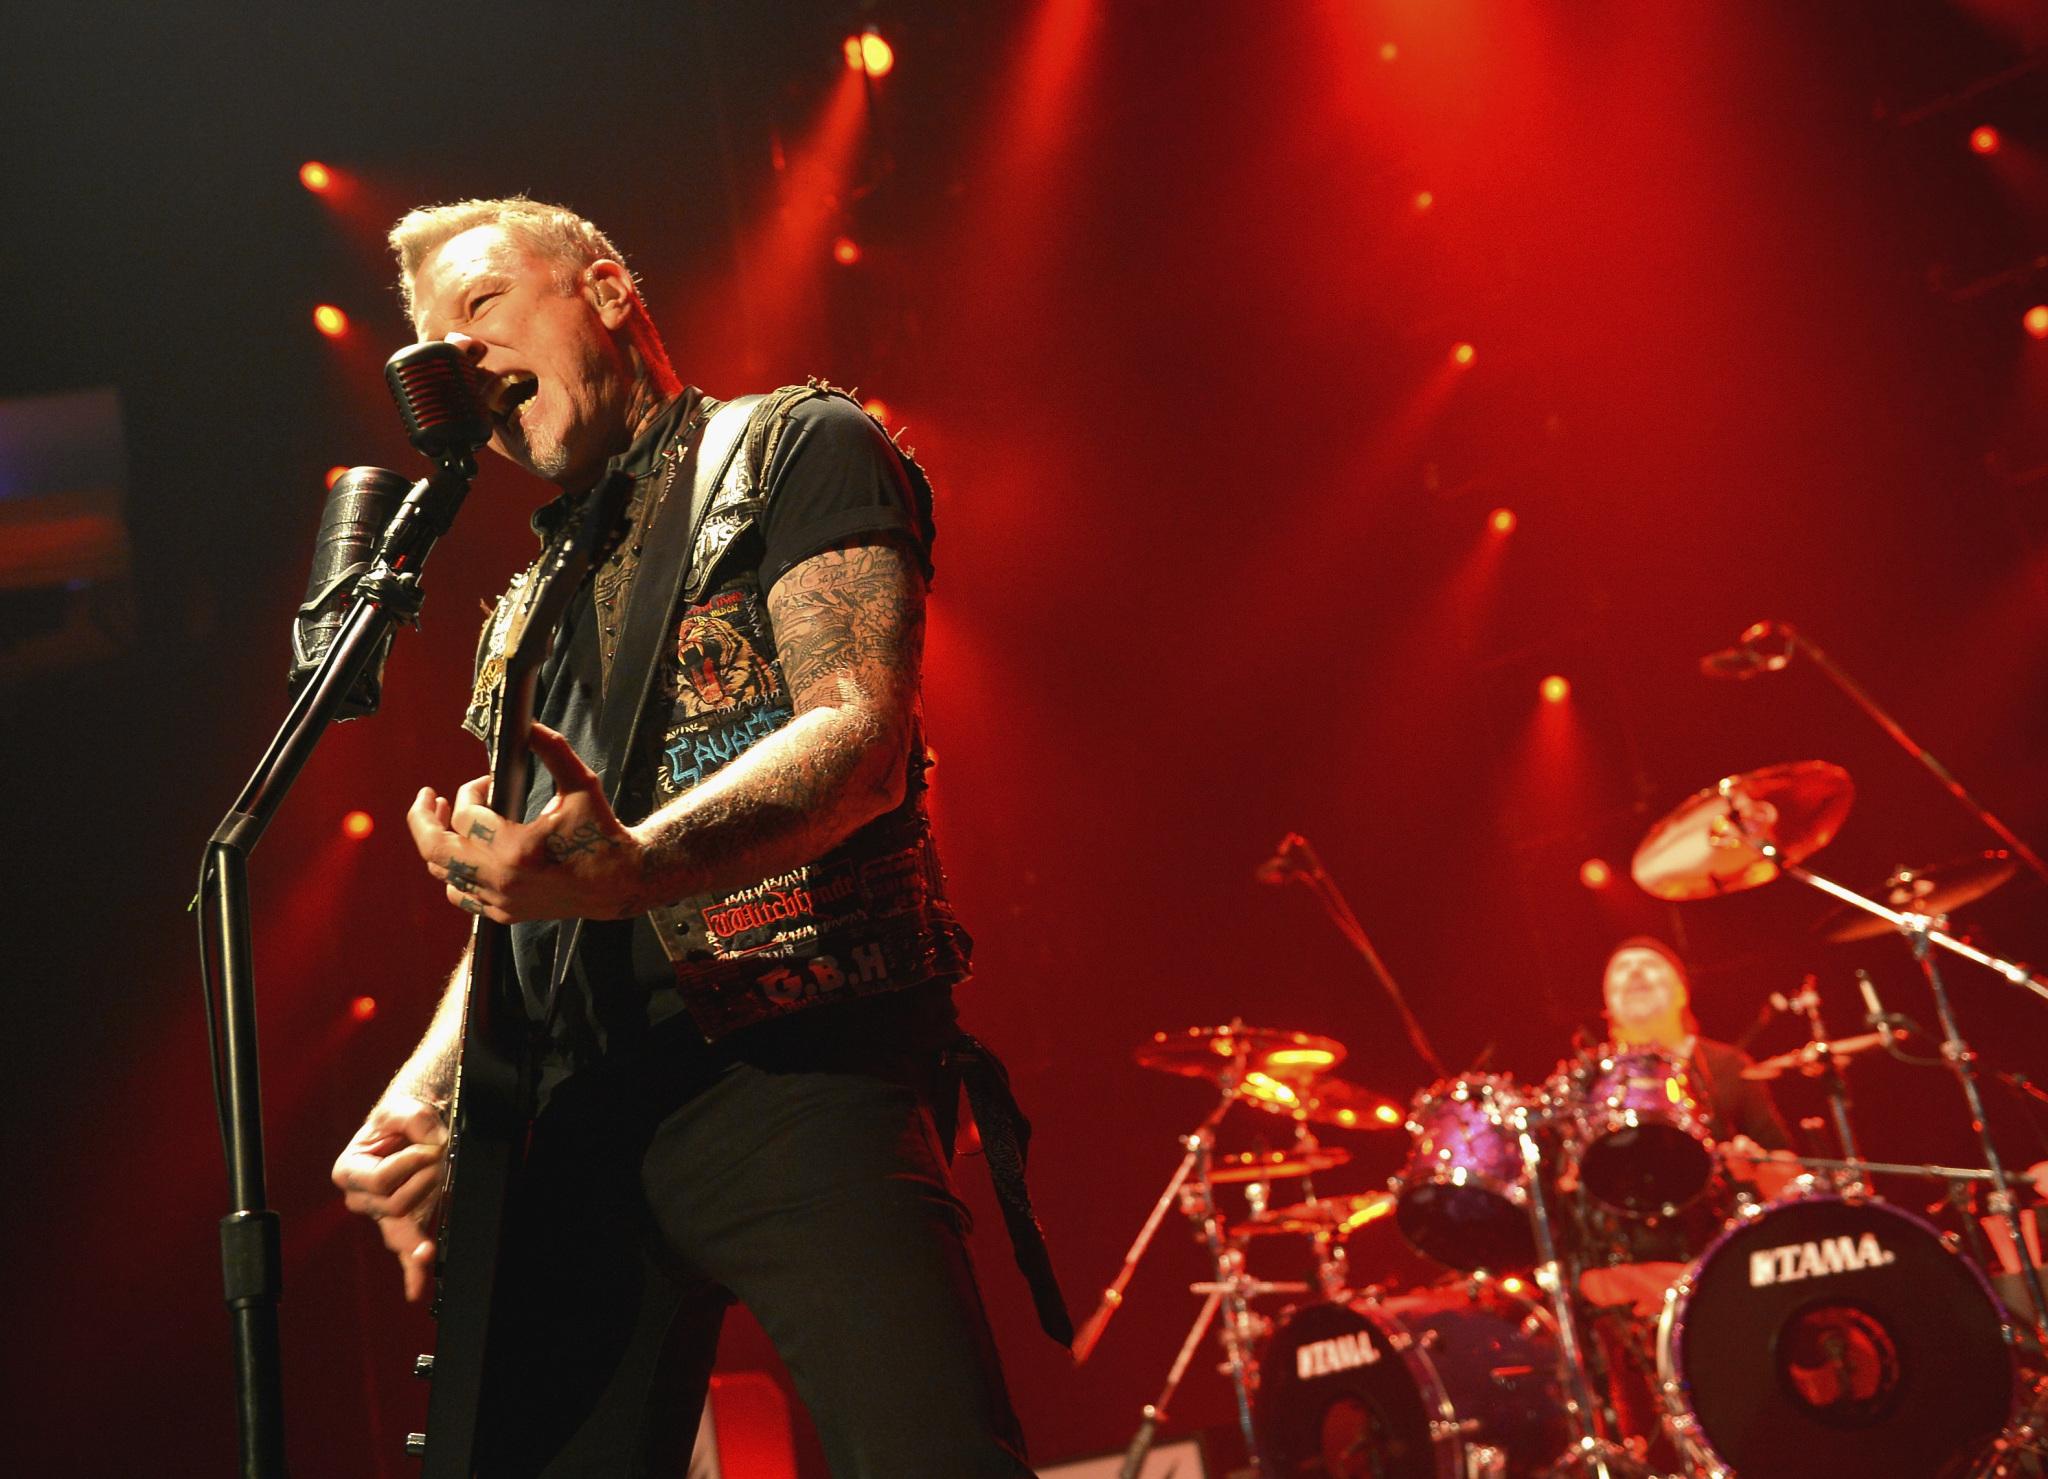 Enter Panaman (Metallica/Van Halen Mashup!)